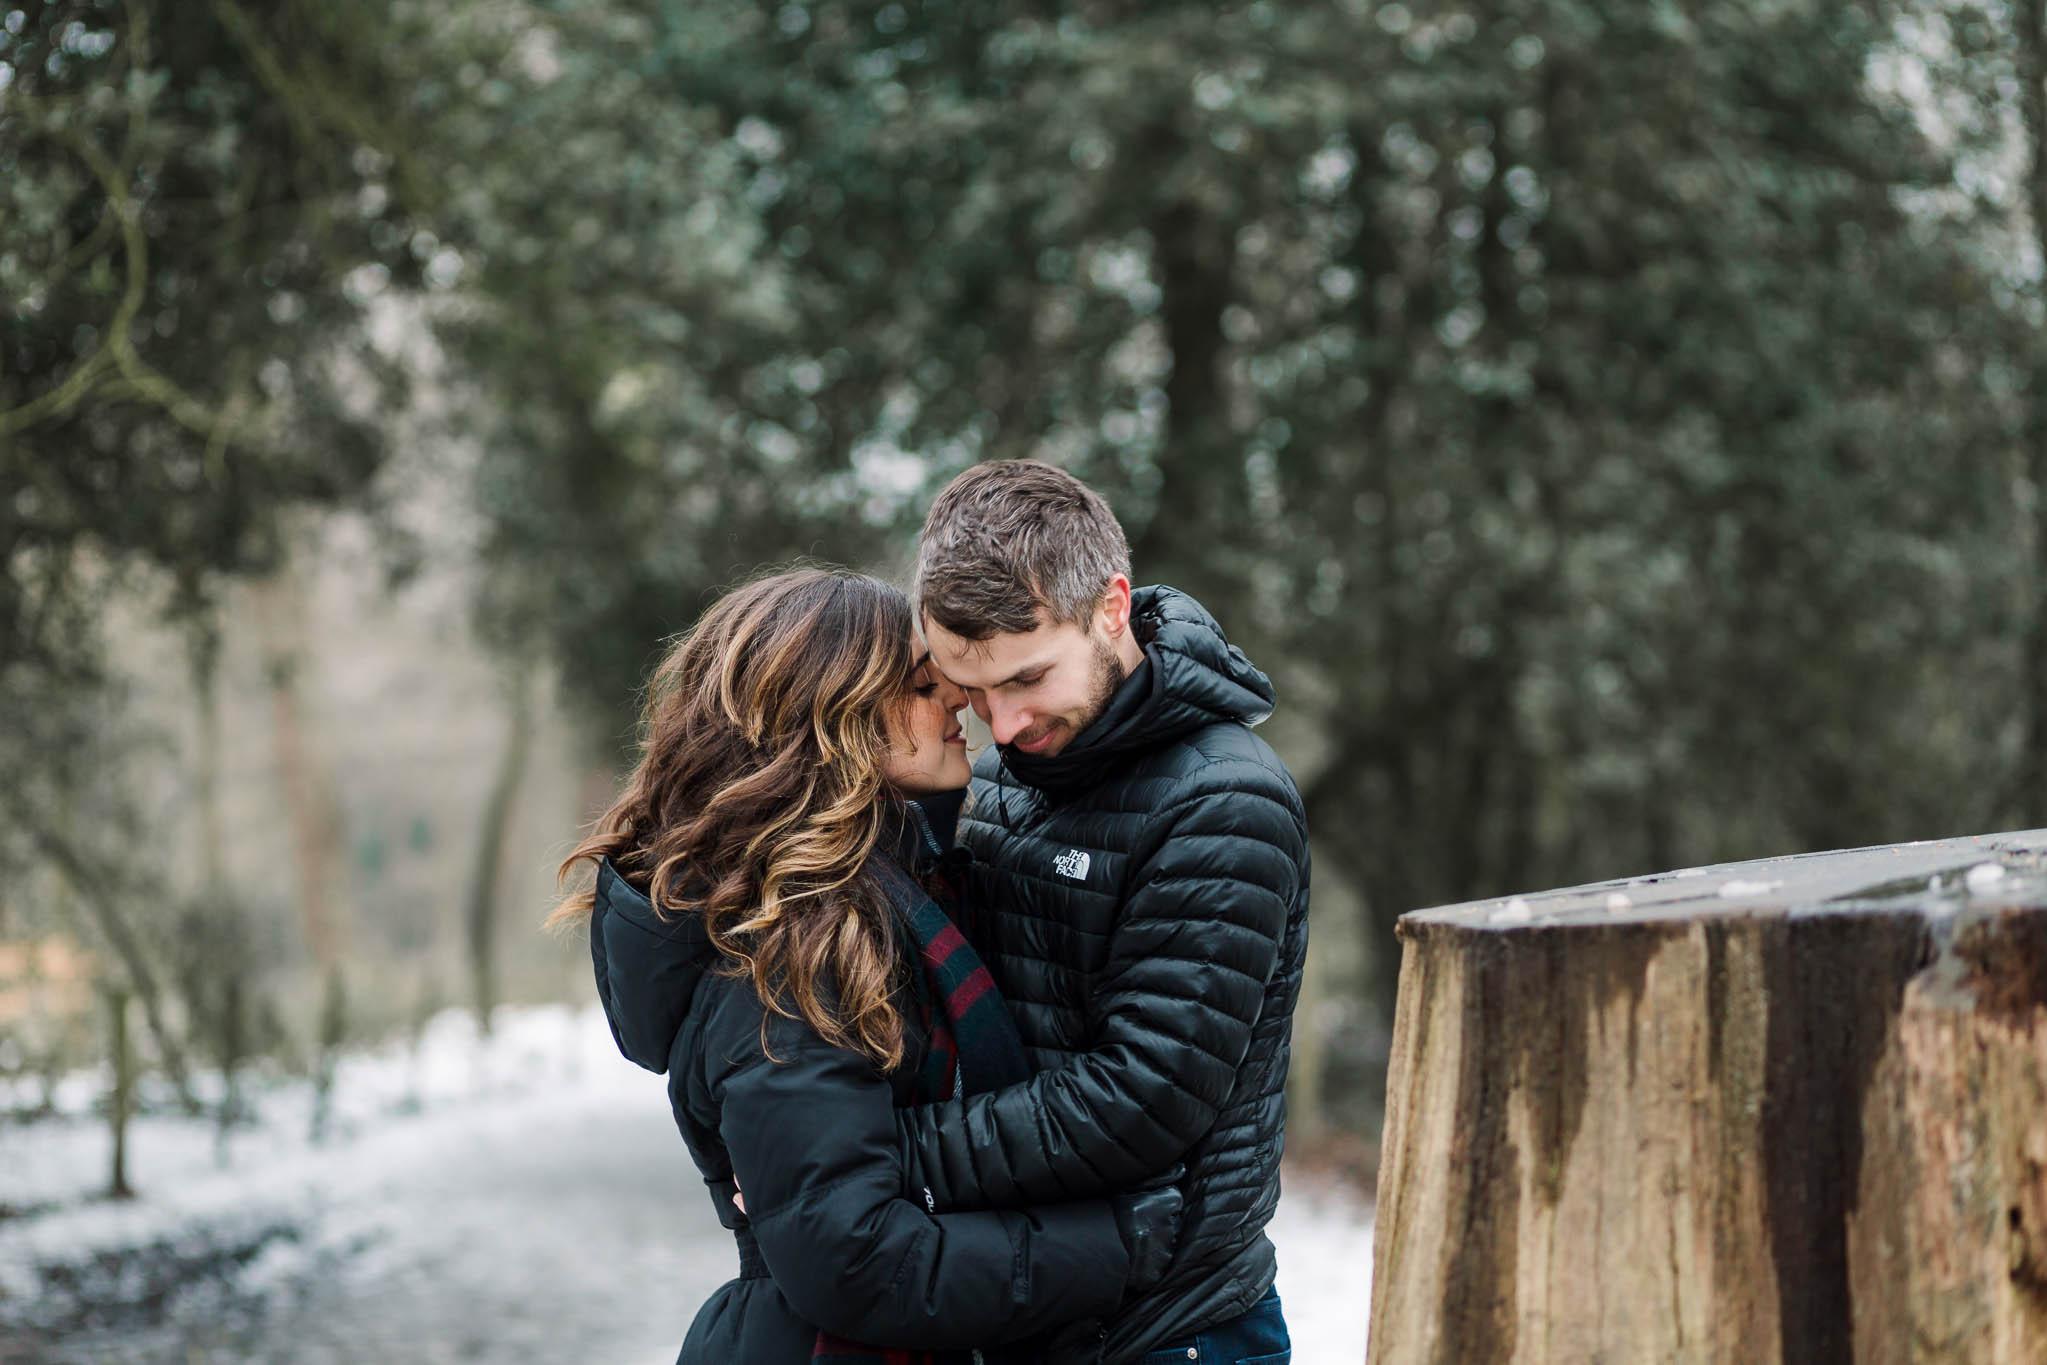 pre-wedding photo shoot in snow in london park